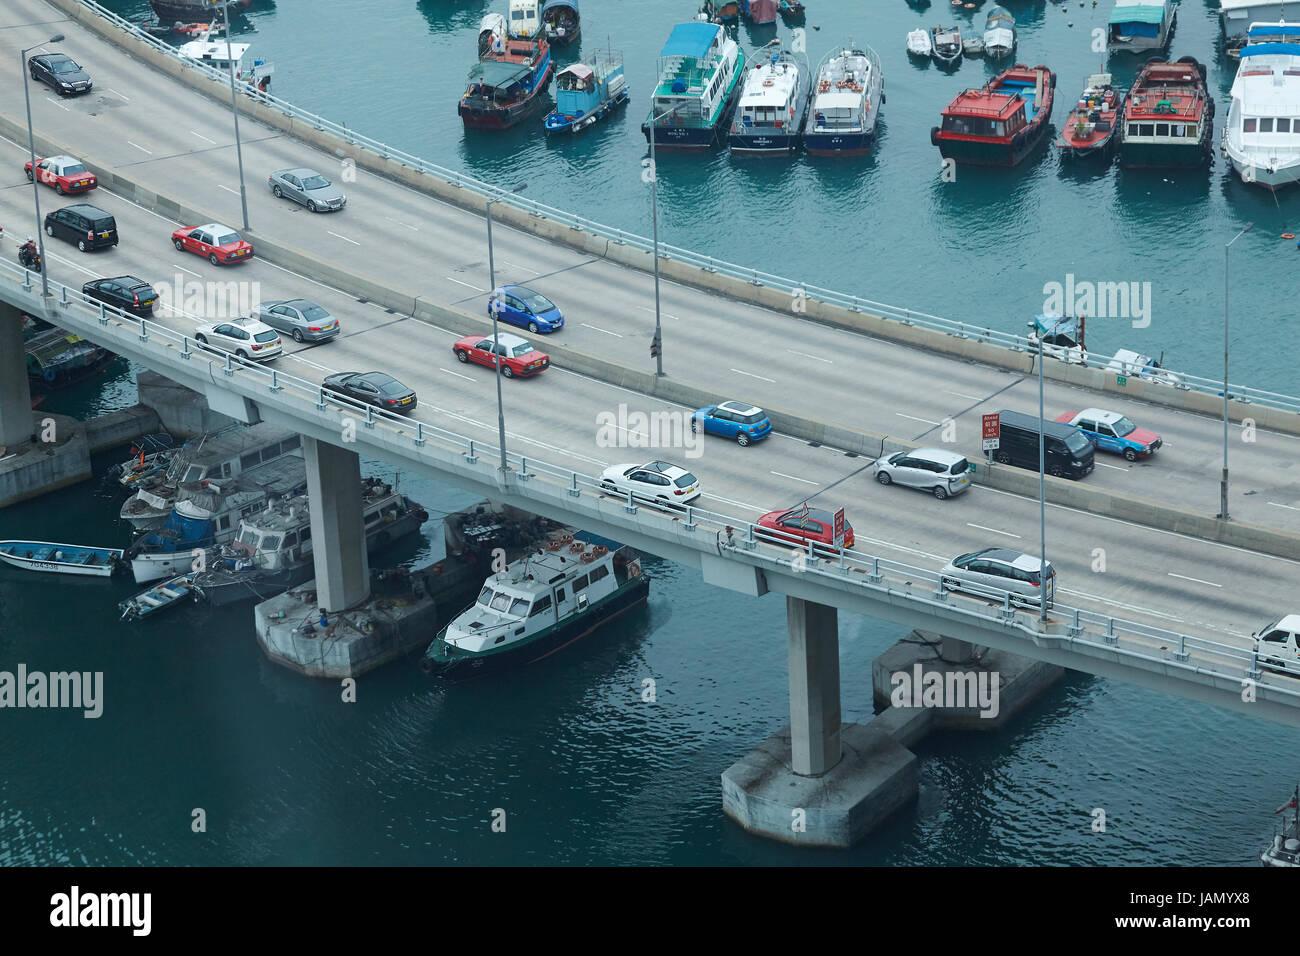 Island Eastern Corridor Motorway by Causeway Bay Typhoon Shelter, Causeway Bay, Hong Kong, China Stock Photo